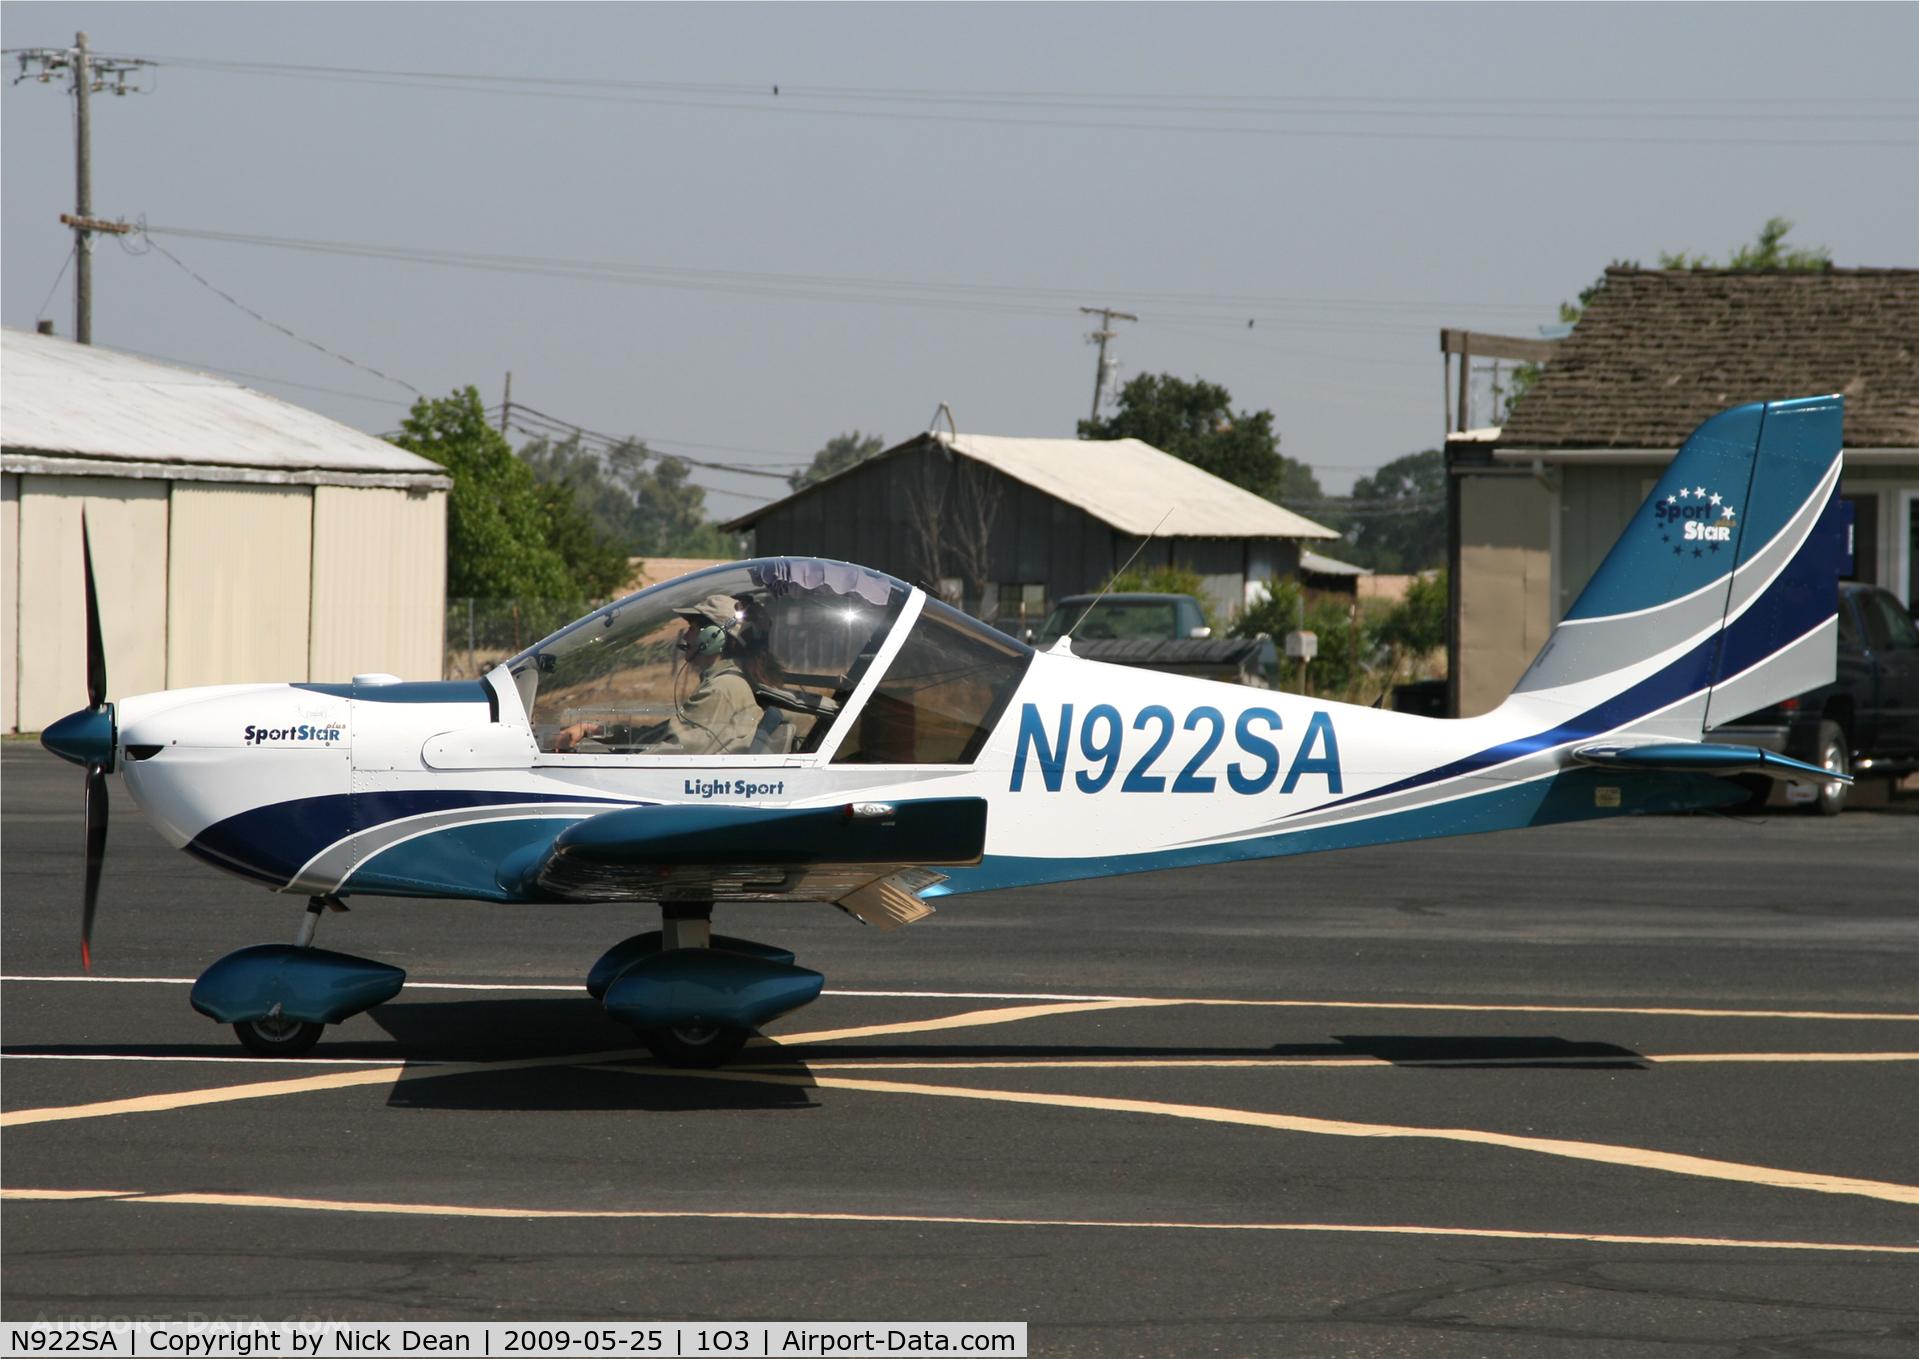 N922SA, 2007 Evektor-Aerotechnik SPORTSTAR PLUS C/N 20070922, 1O3